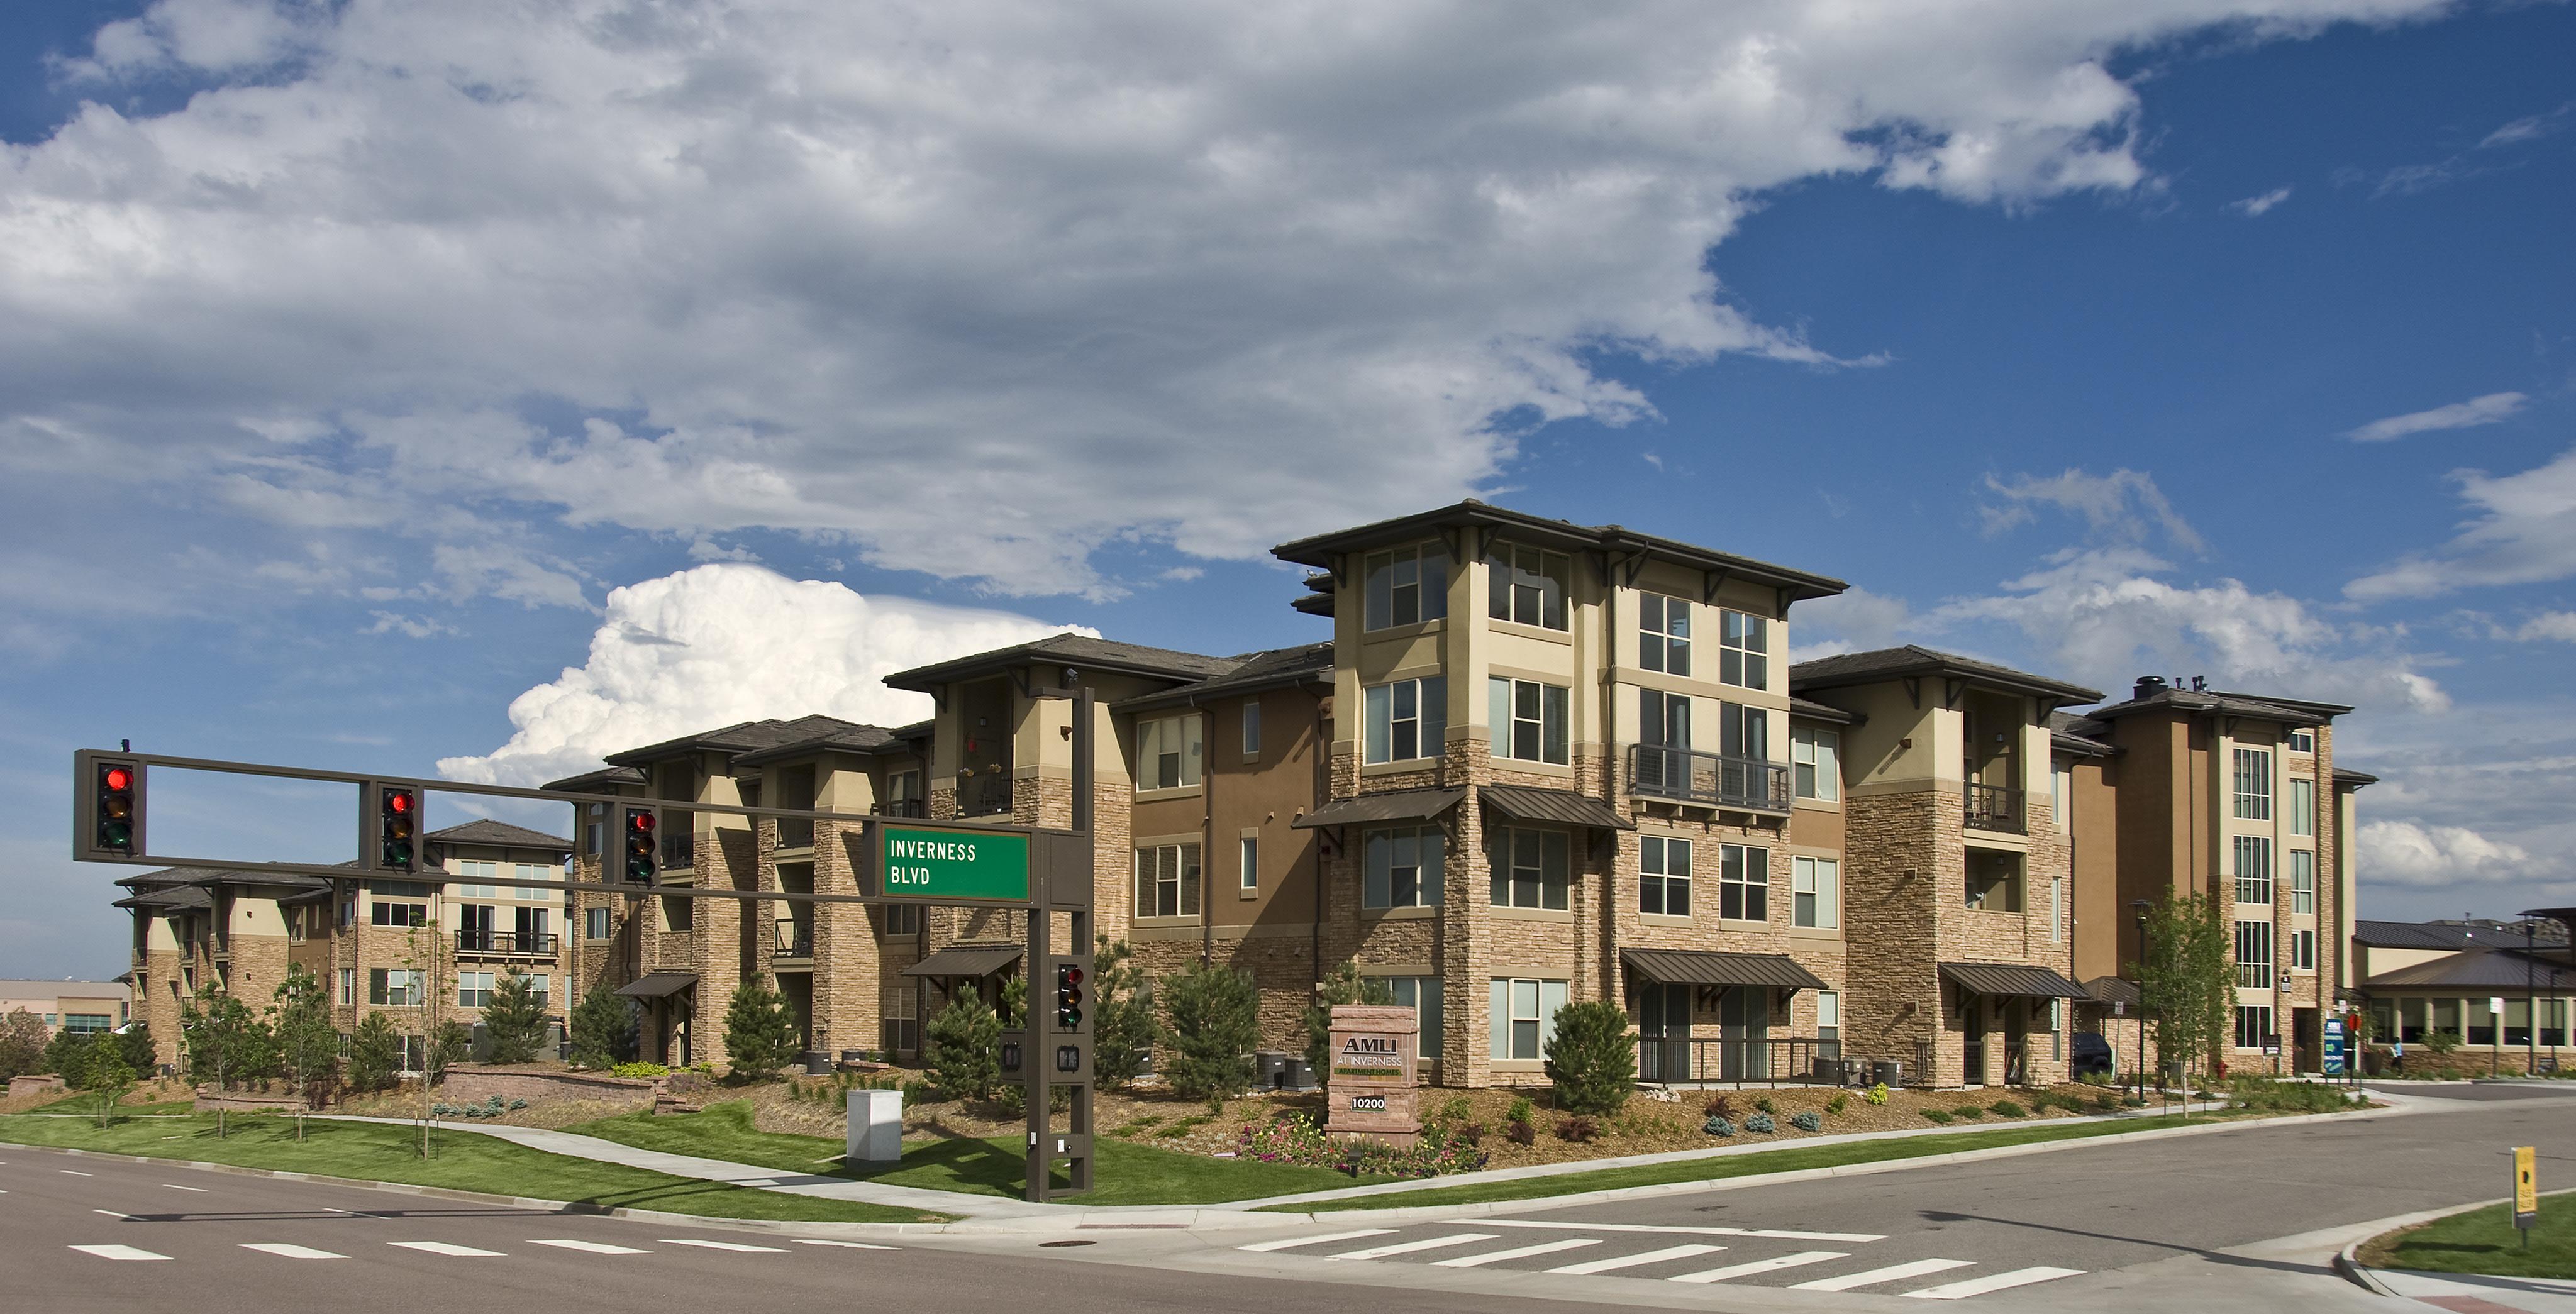 1 2 3 Bedroom Apartments In Denver Co Floor Plans